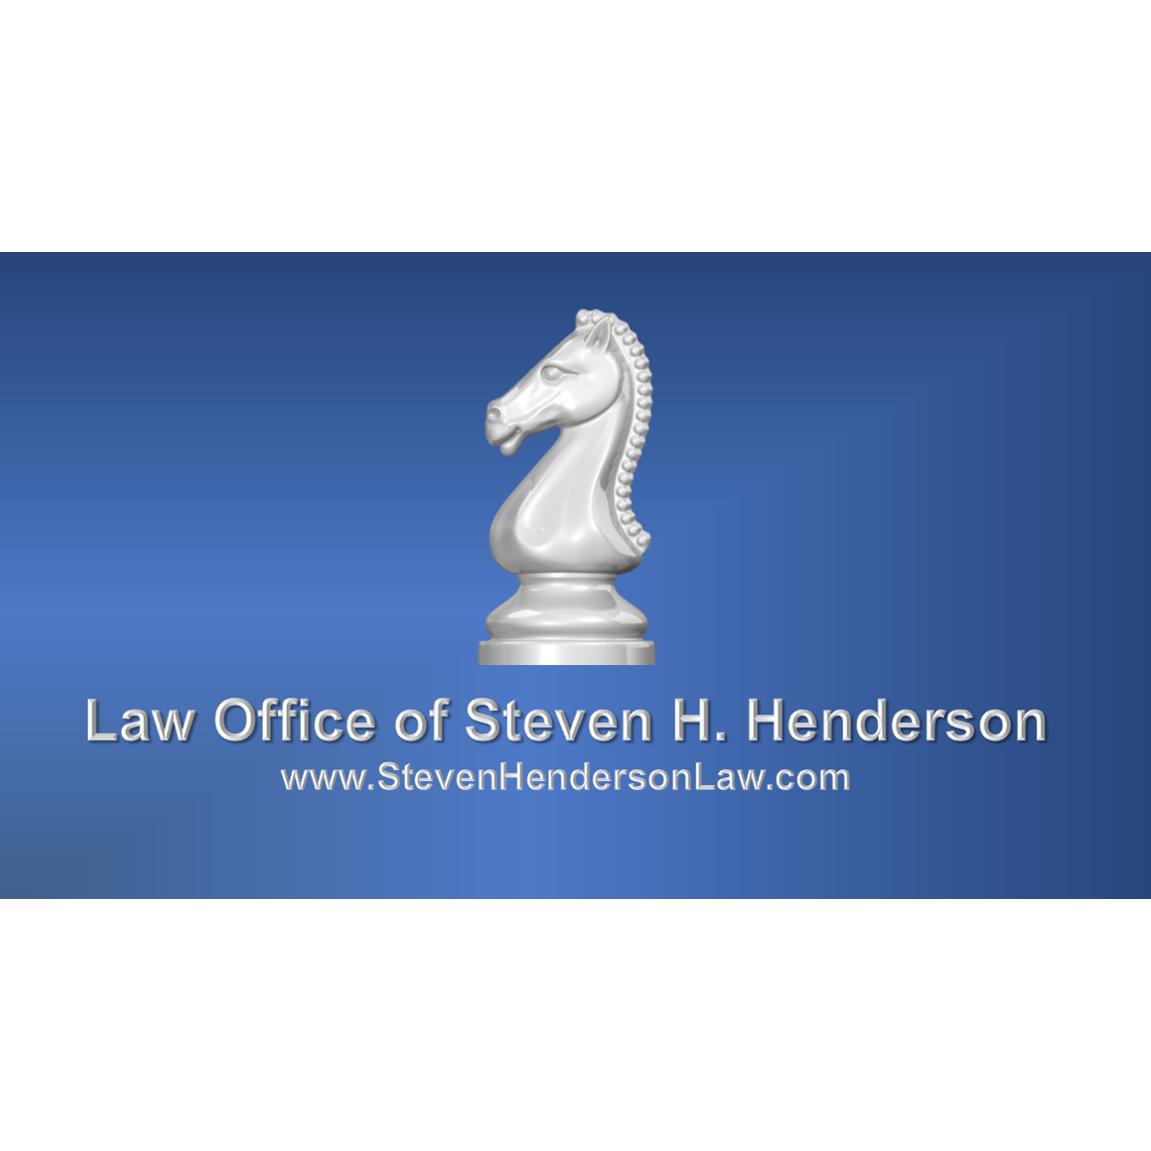 Law Office of Steven H. Henderson & Jill Stern-Henderson - Pittsburg, CA - Attorneys